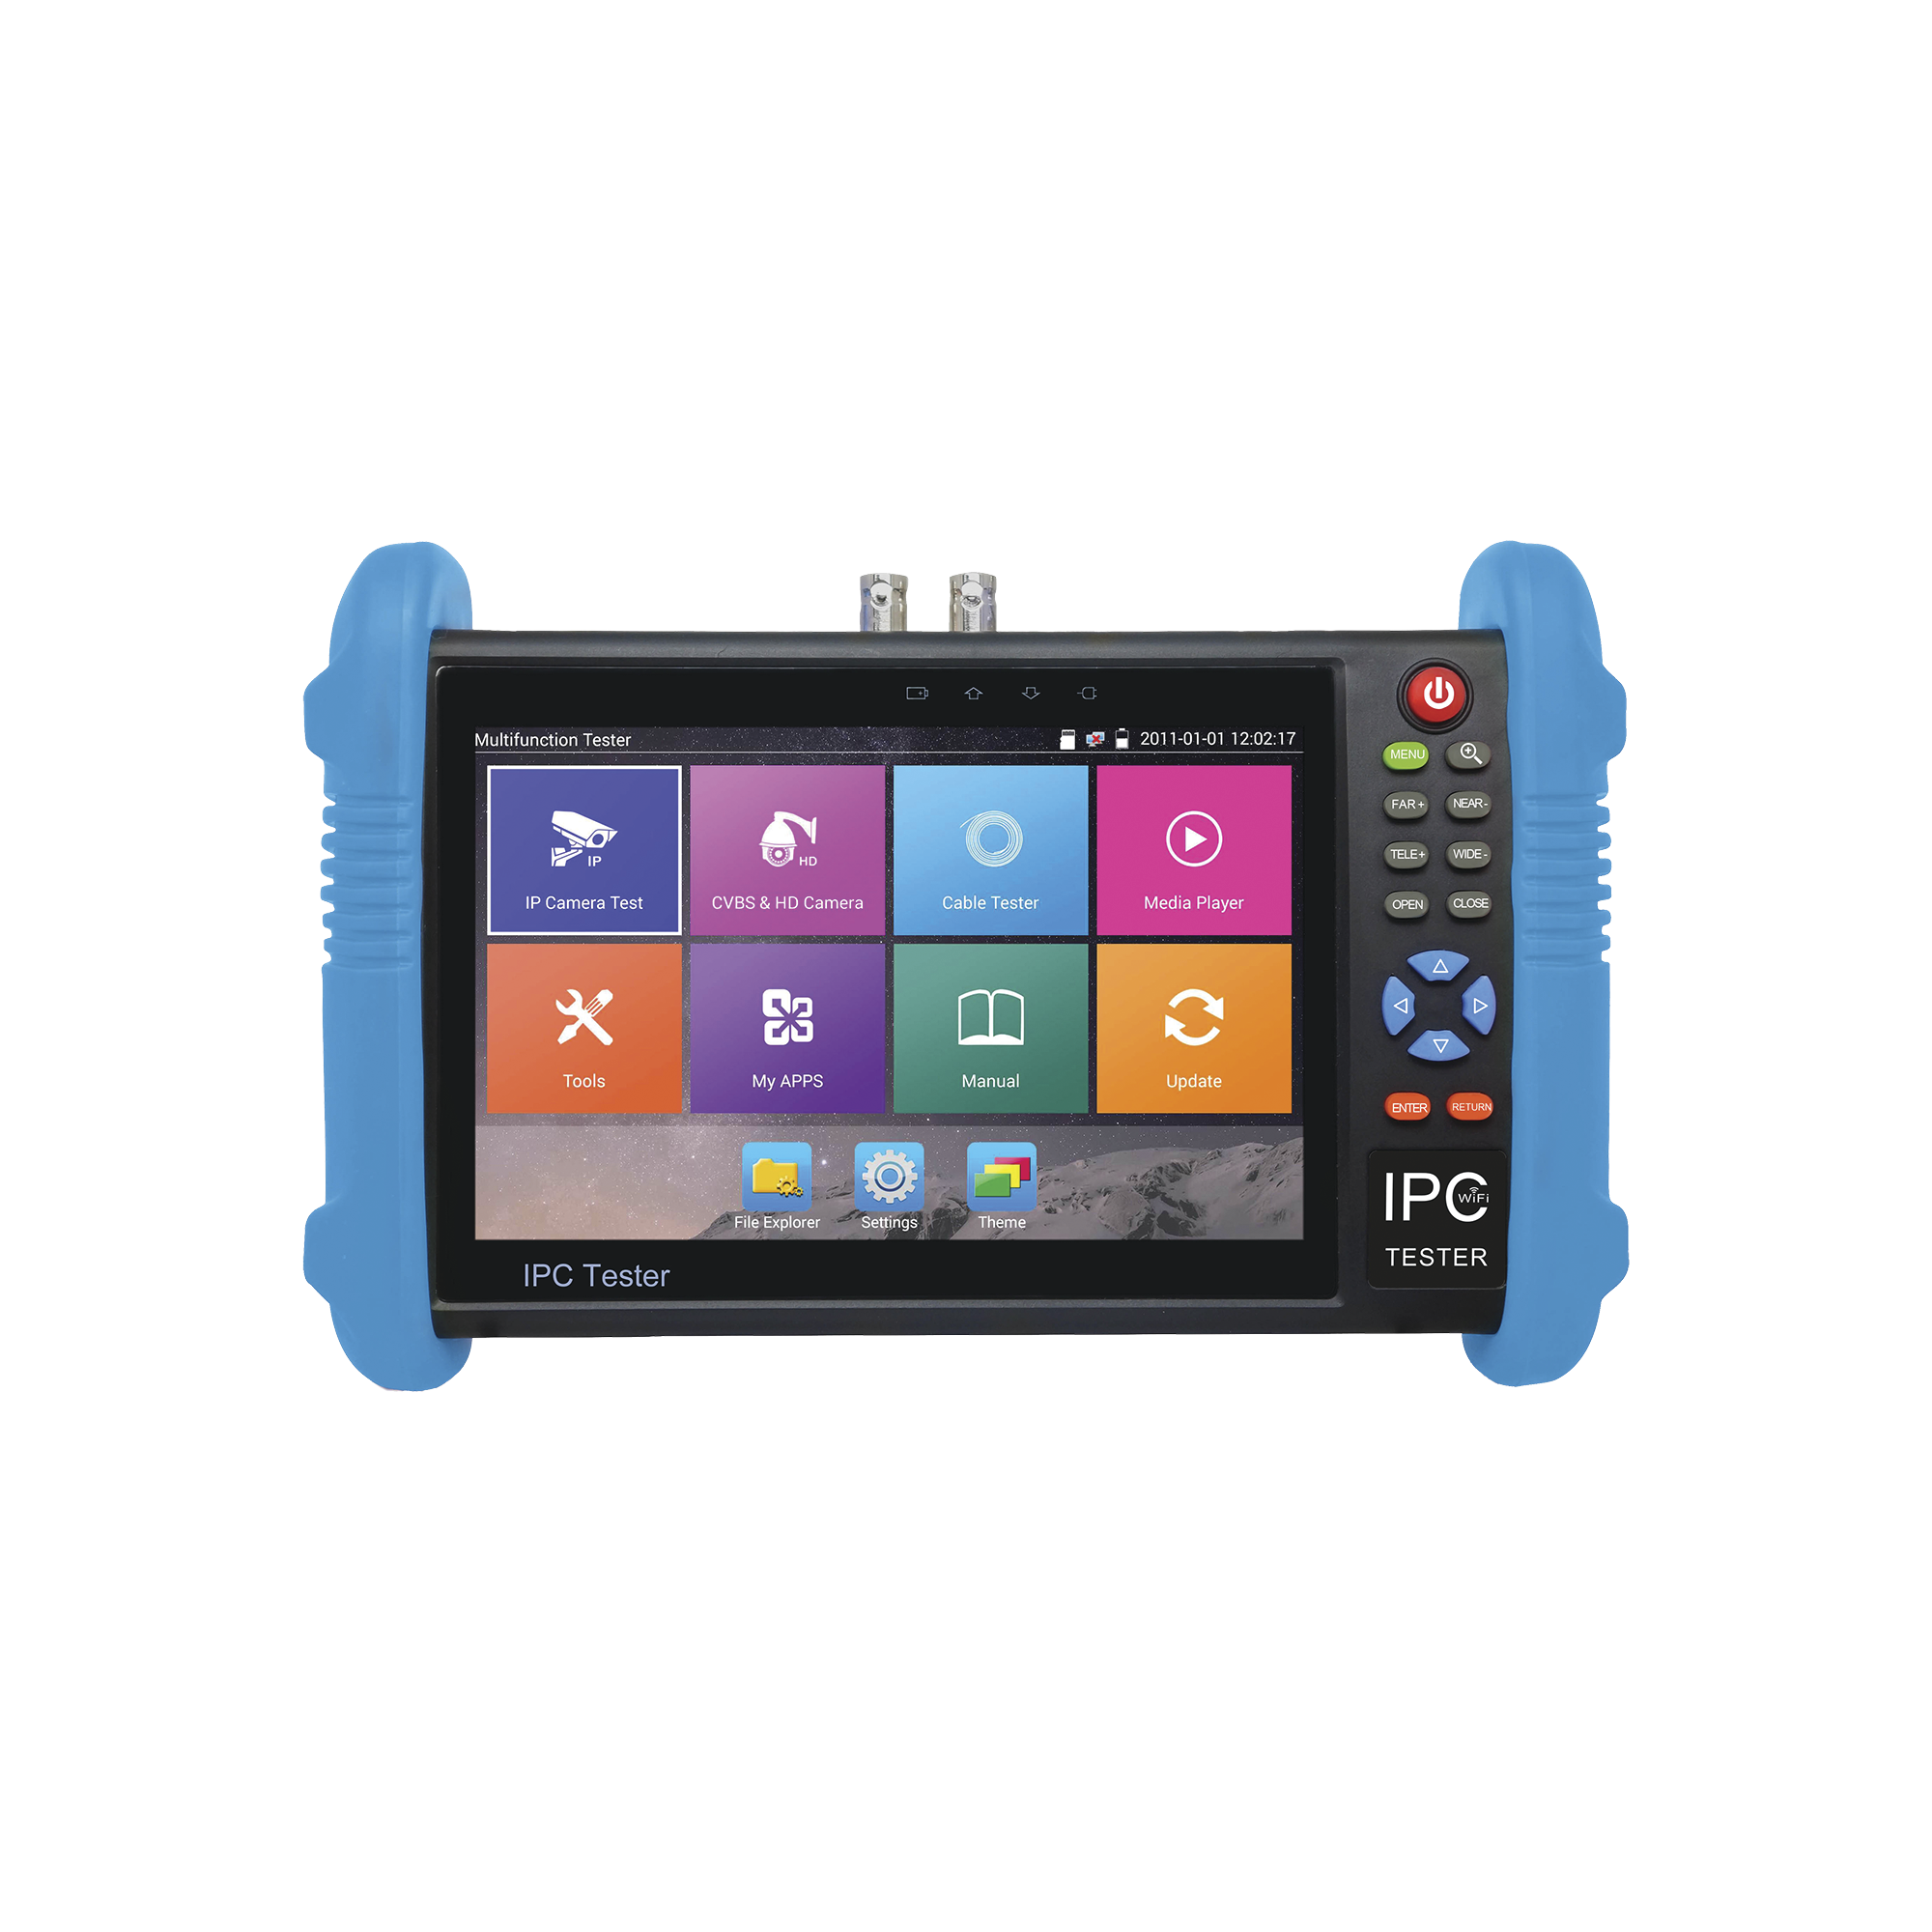 Probador de Vídeo Android con Pantalla LCD de 7 para IP ONVIF / HD-TVI 5MP (TurboHD) / Análogo, ONVIF, Wi-Fi, Scanner IP, WiFi, entrada HDMI